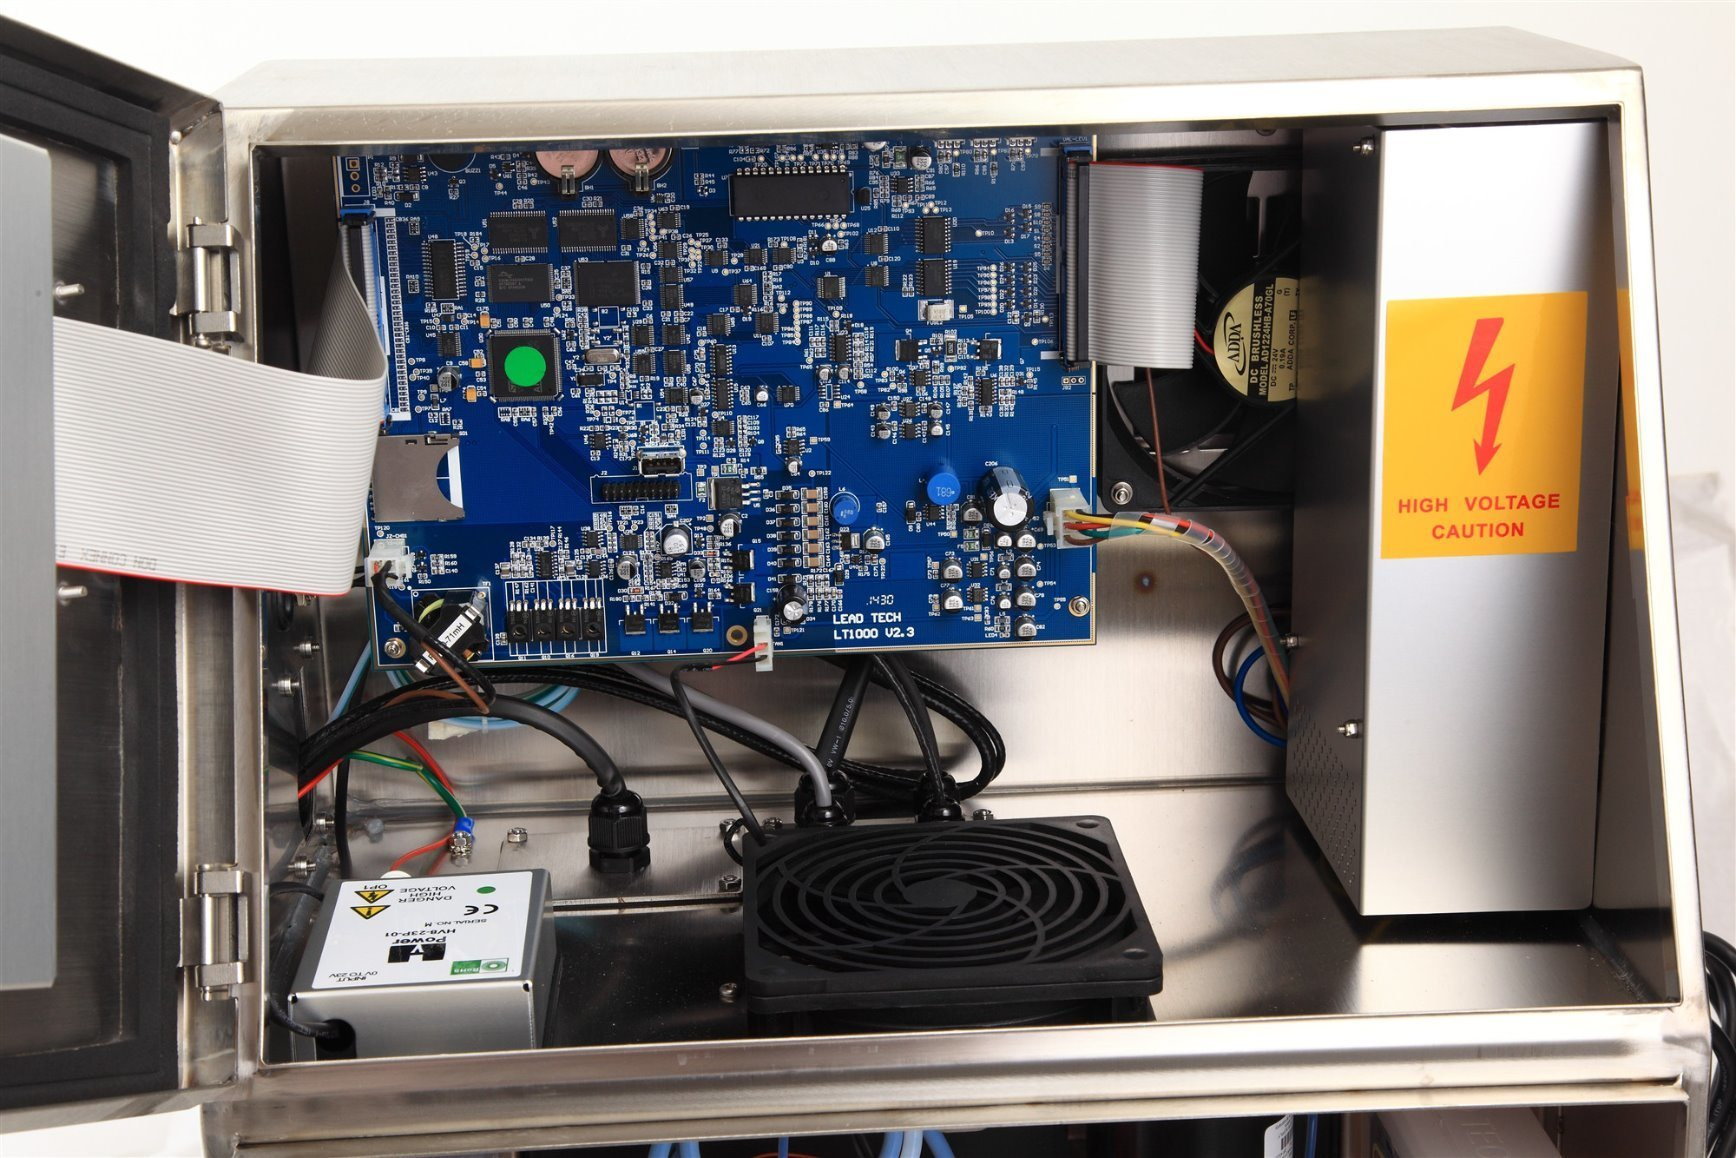 Lead Tech Lt1000s+ Moving Head Printing Cij Inkjet Printer